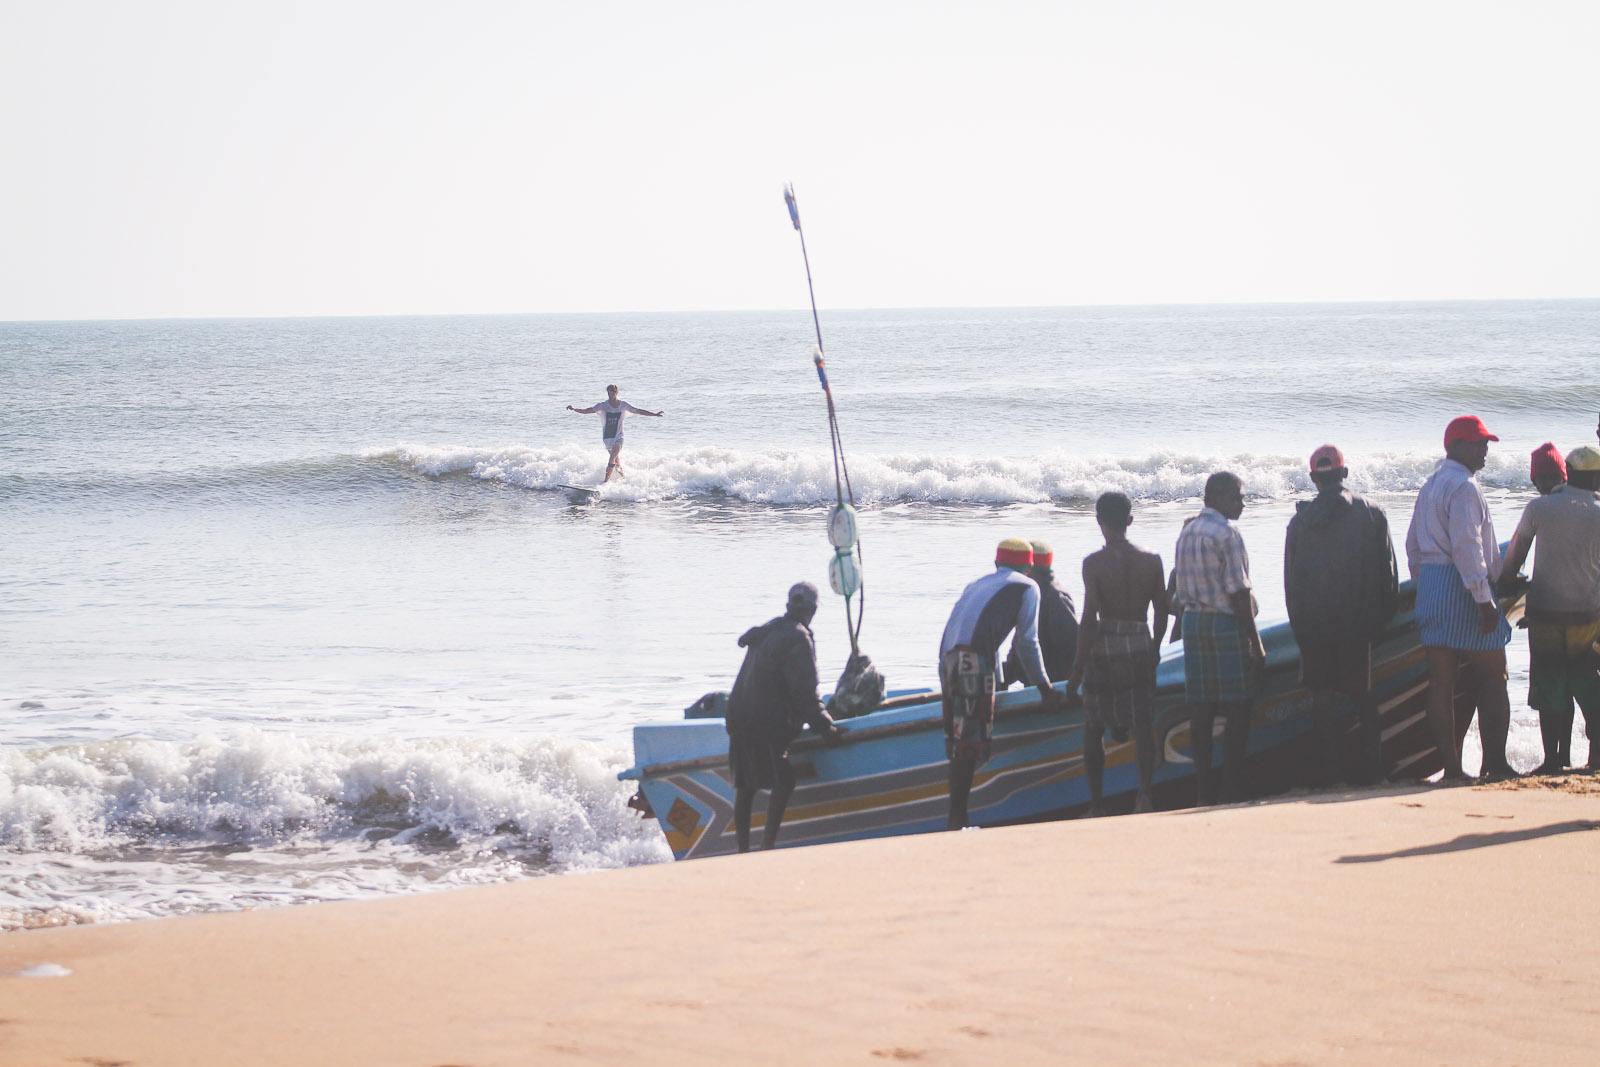 Sunshinestories-surf-travel-blog-IMG_9264